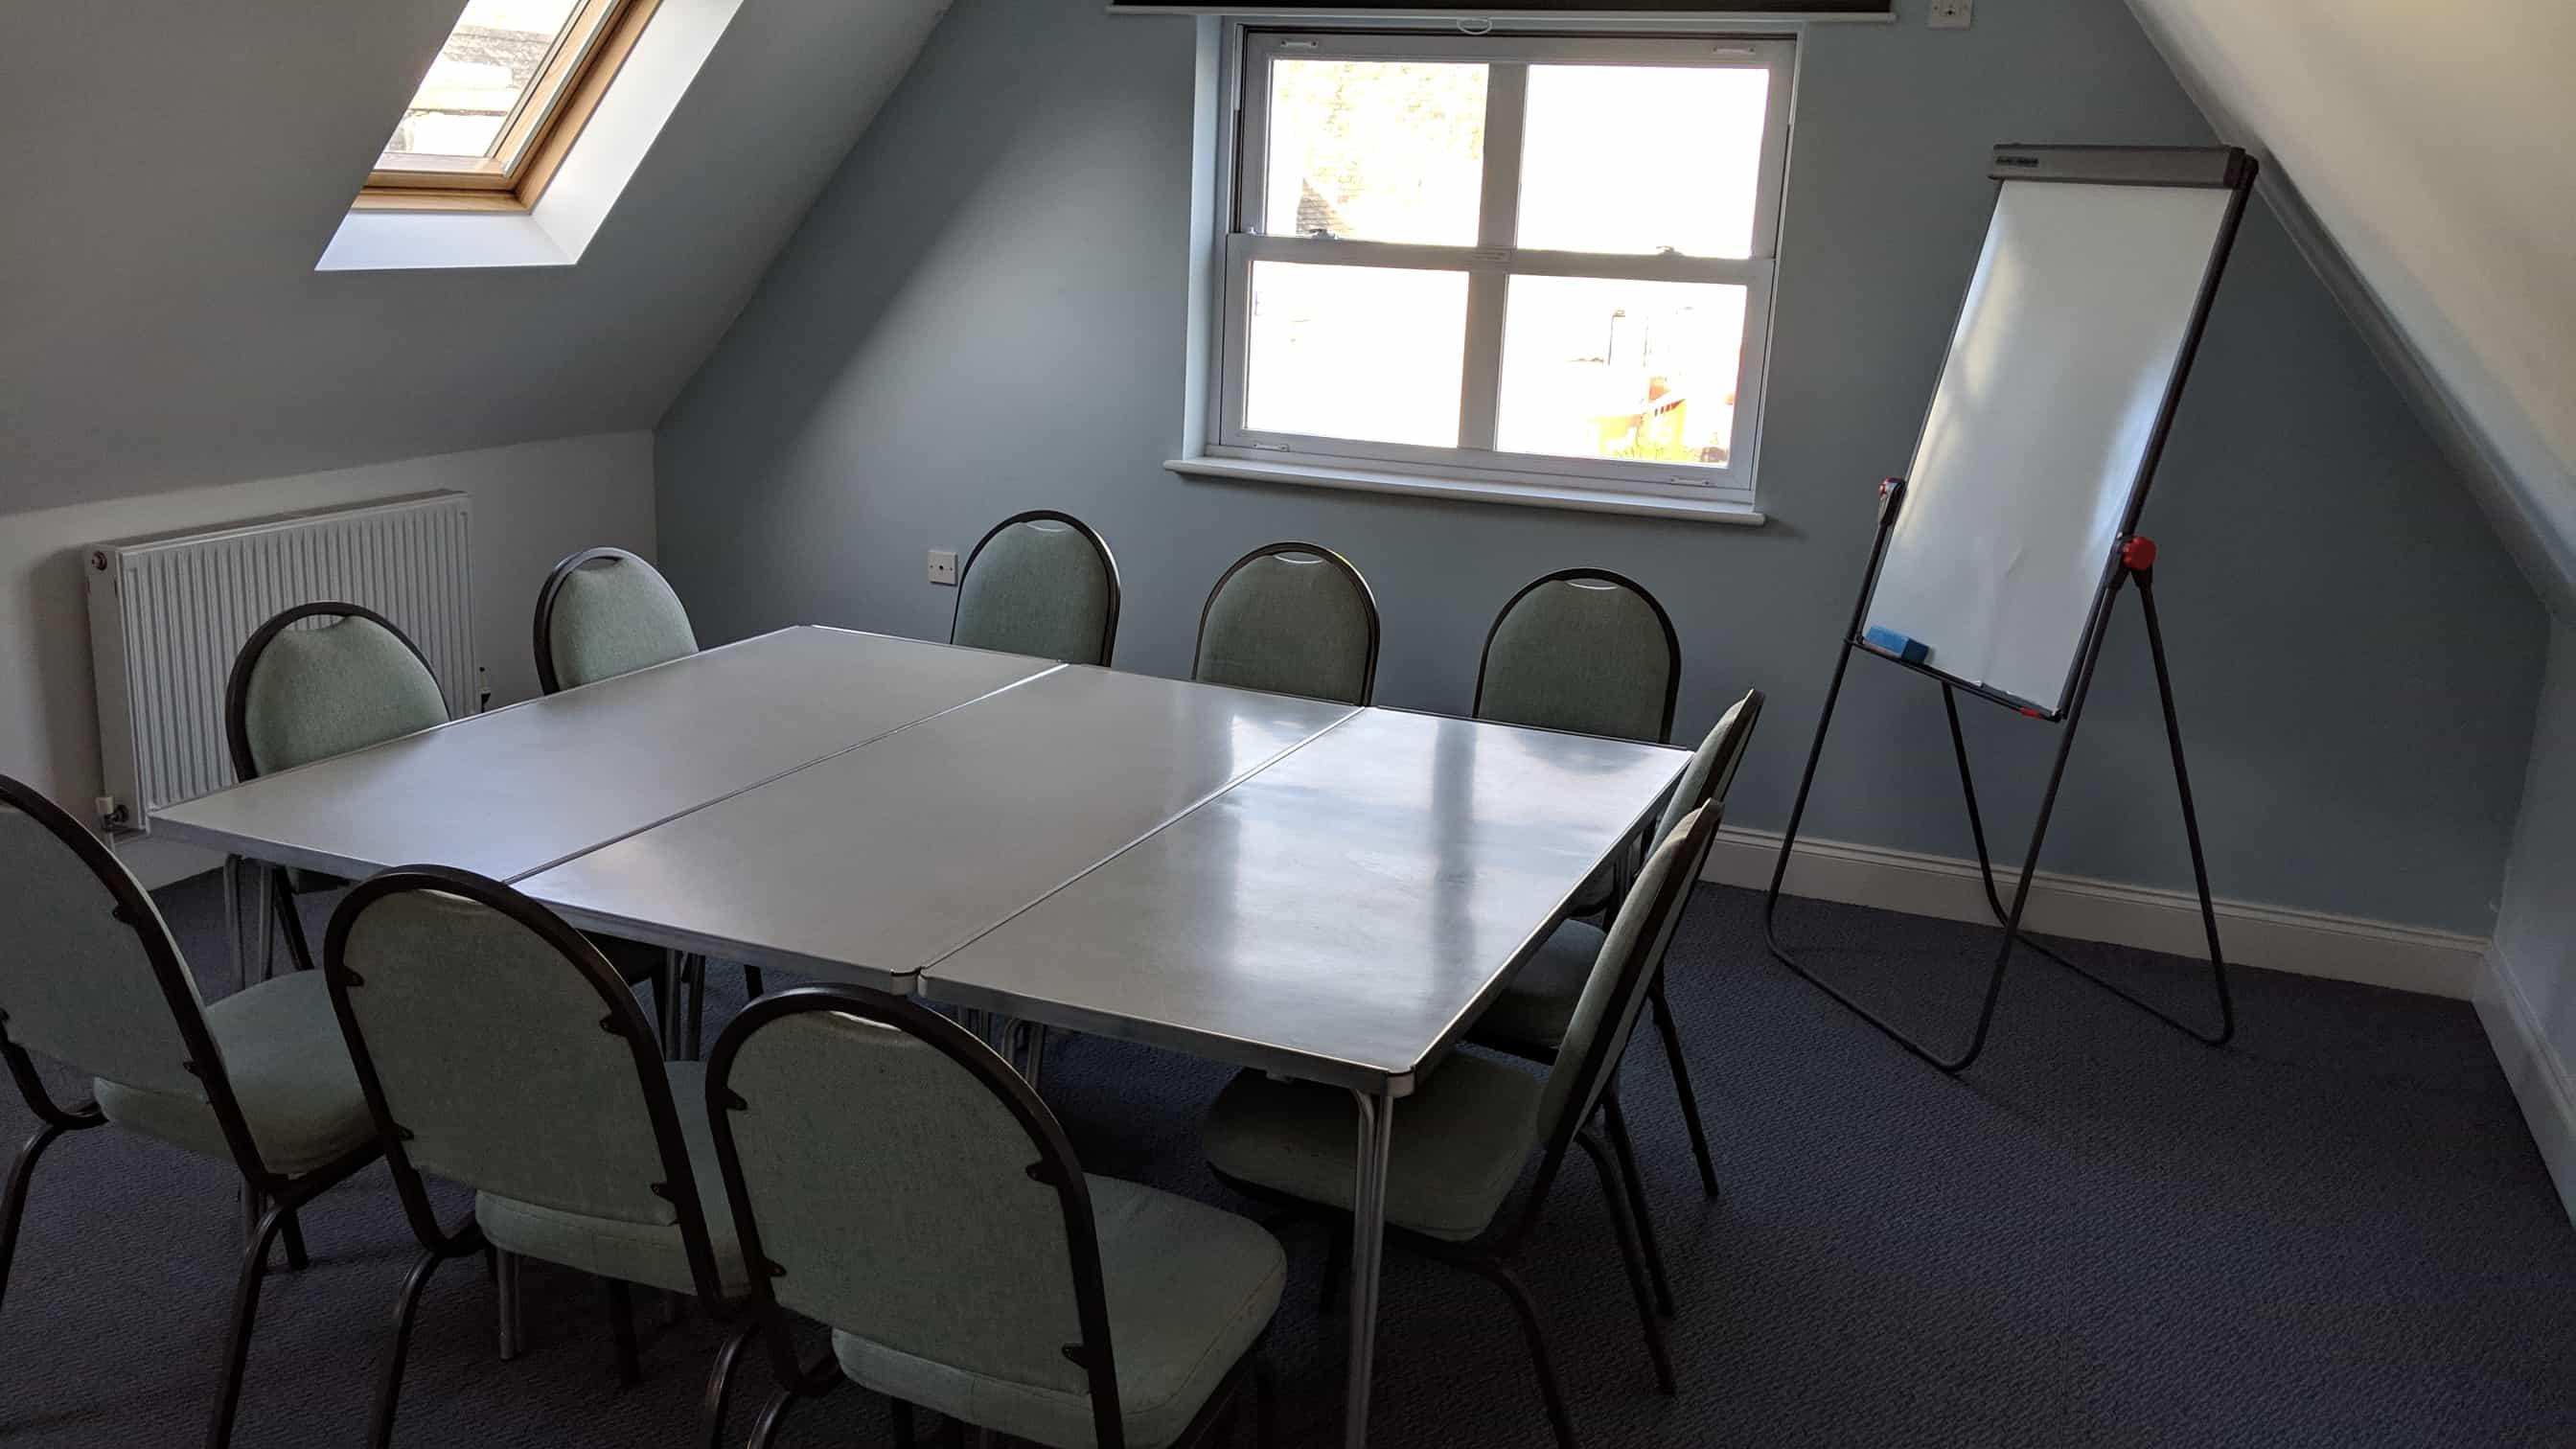 Treece Room